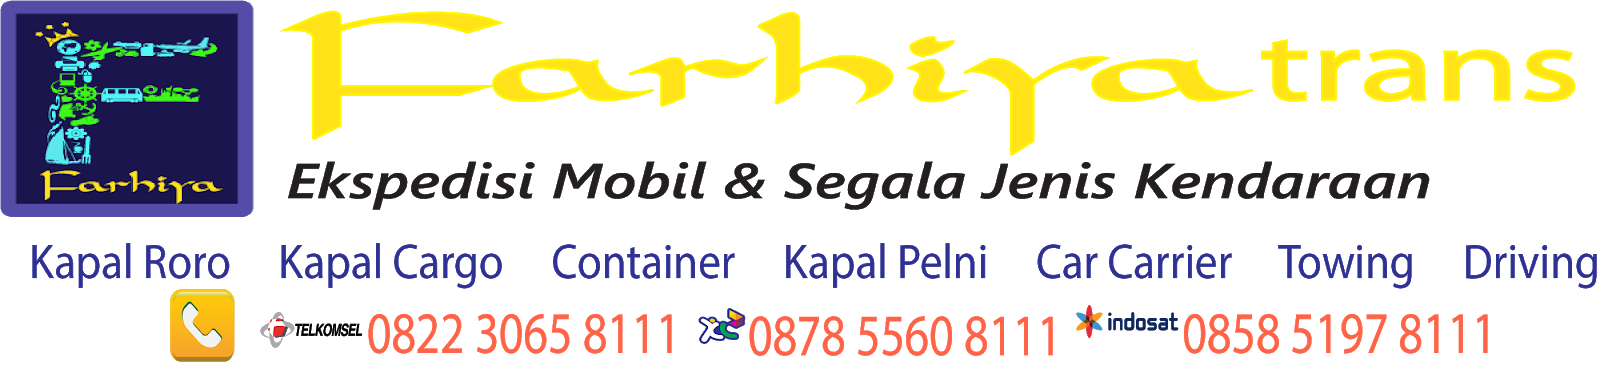 Ekspedisi Pengiriman Kendaraan Surabaya - Jasa Kirim Mobil Truk, Bus, Motor, Tronton, Alat Berat